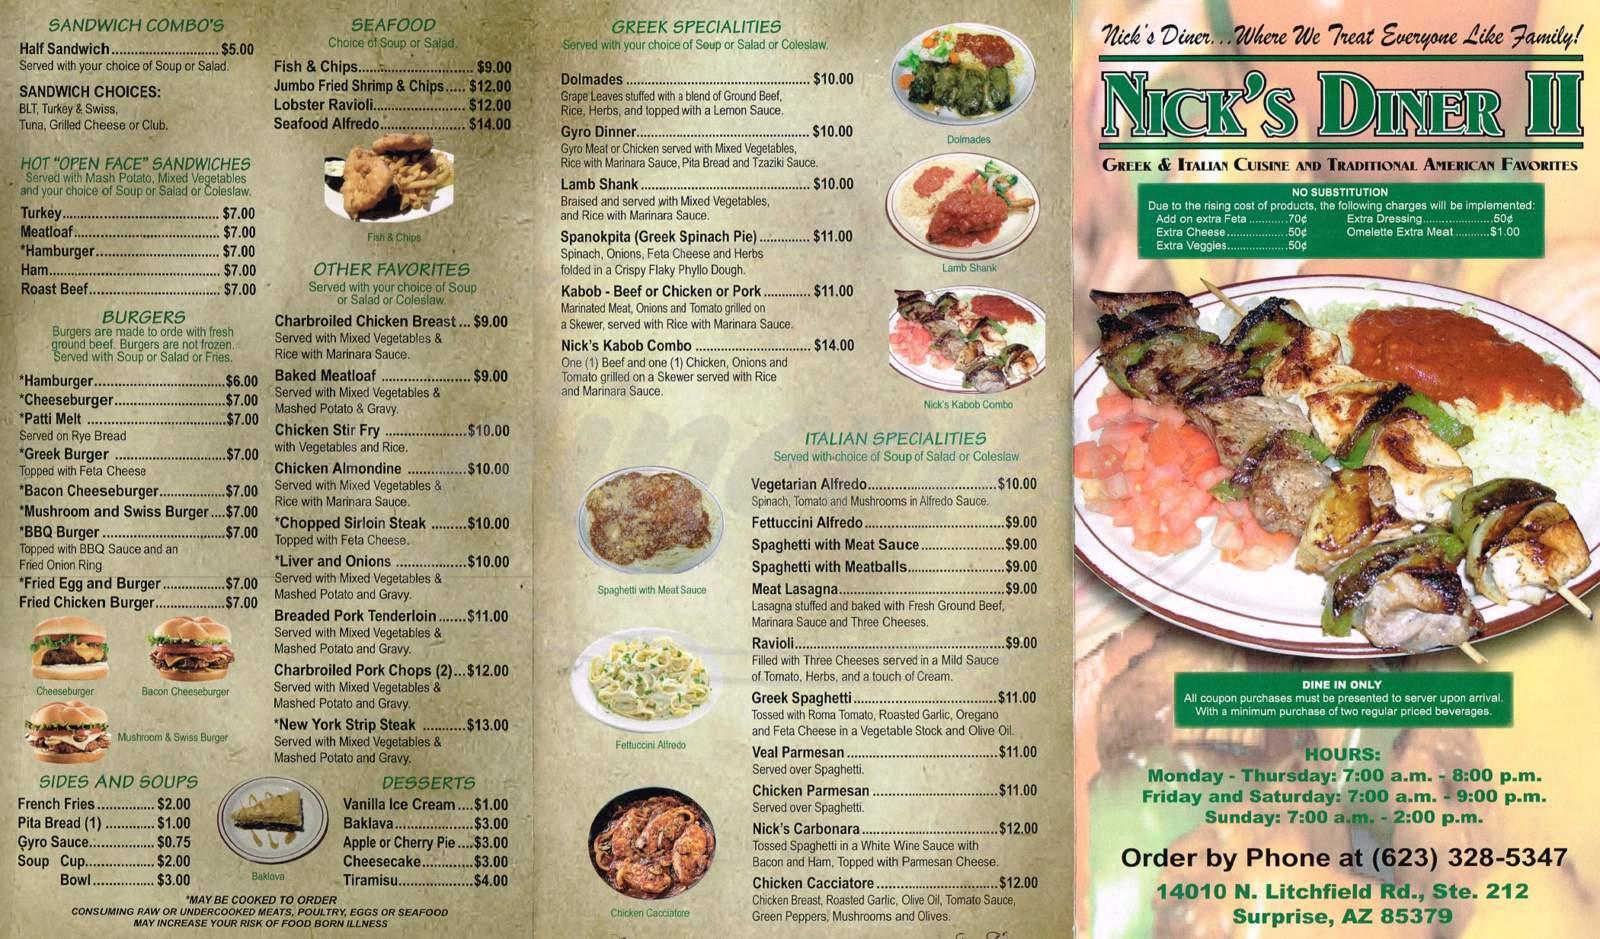 menu for Nick's Diner II, LLC